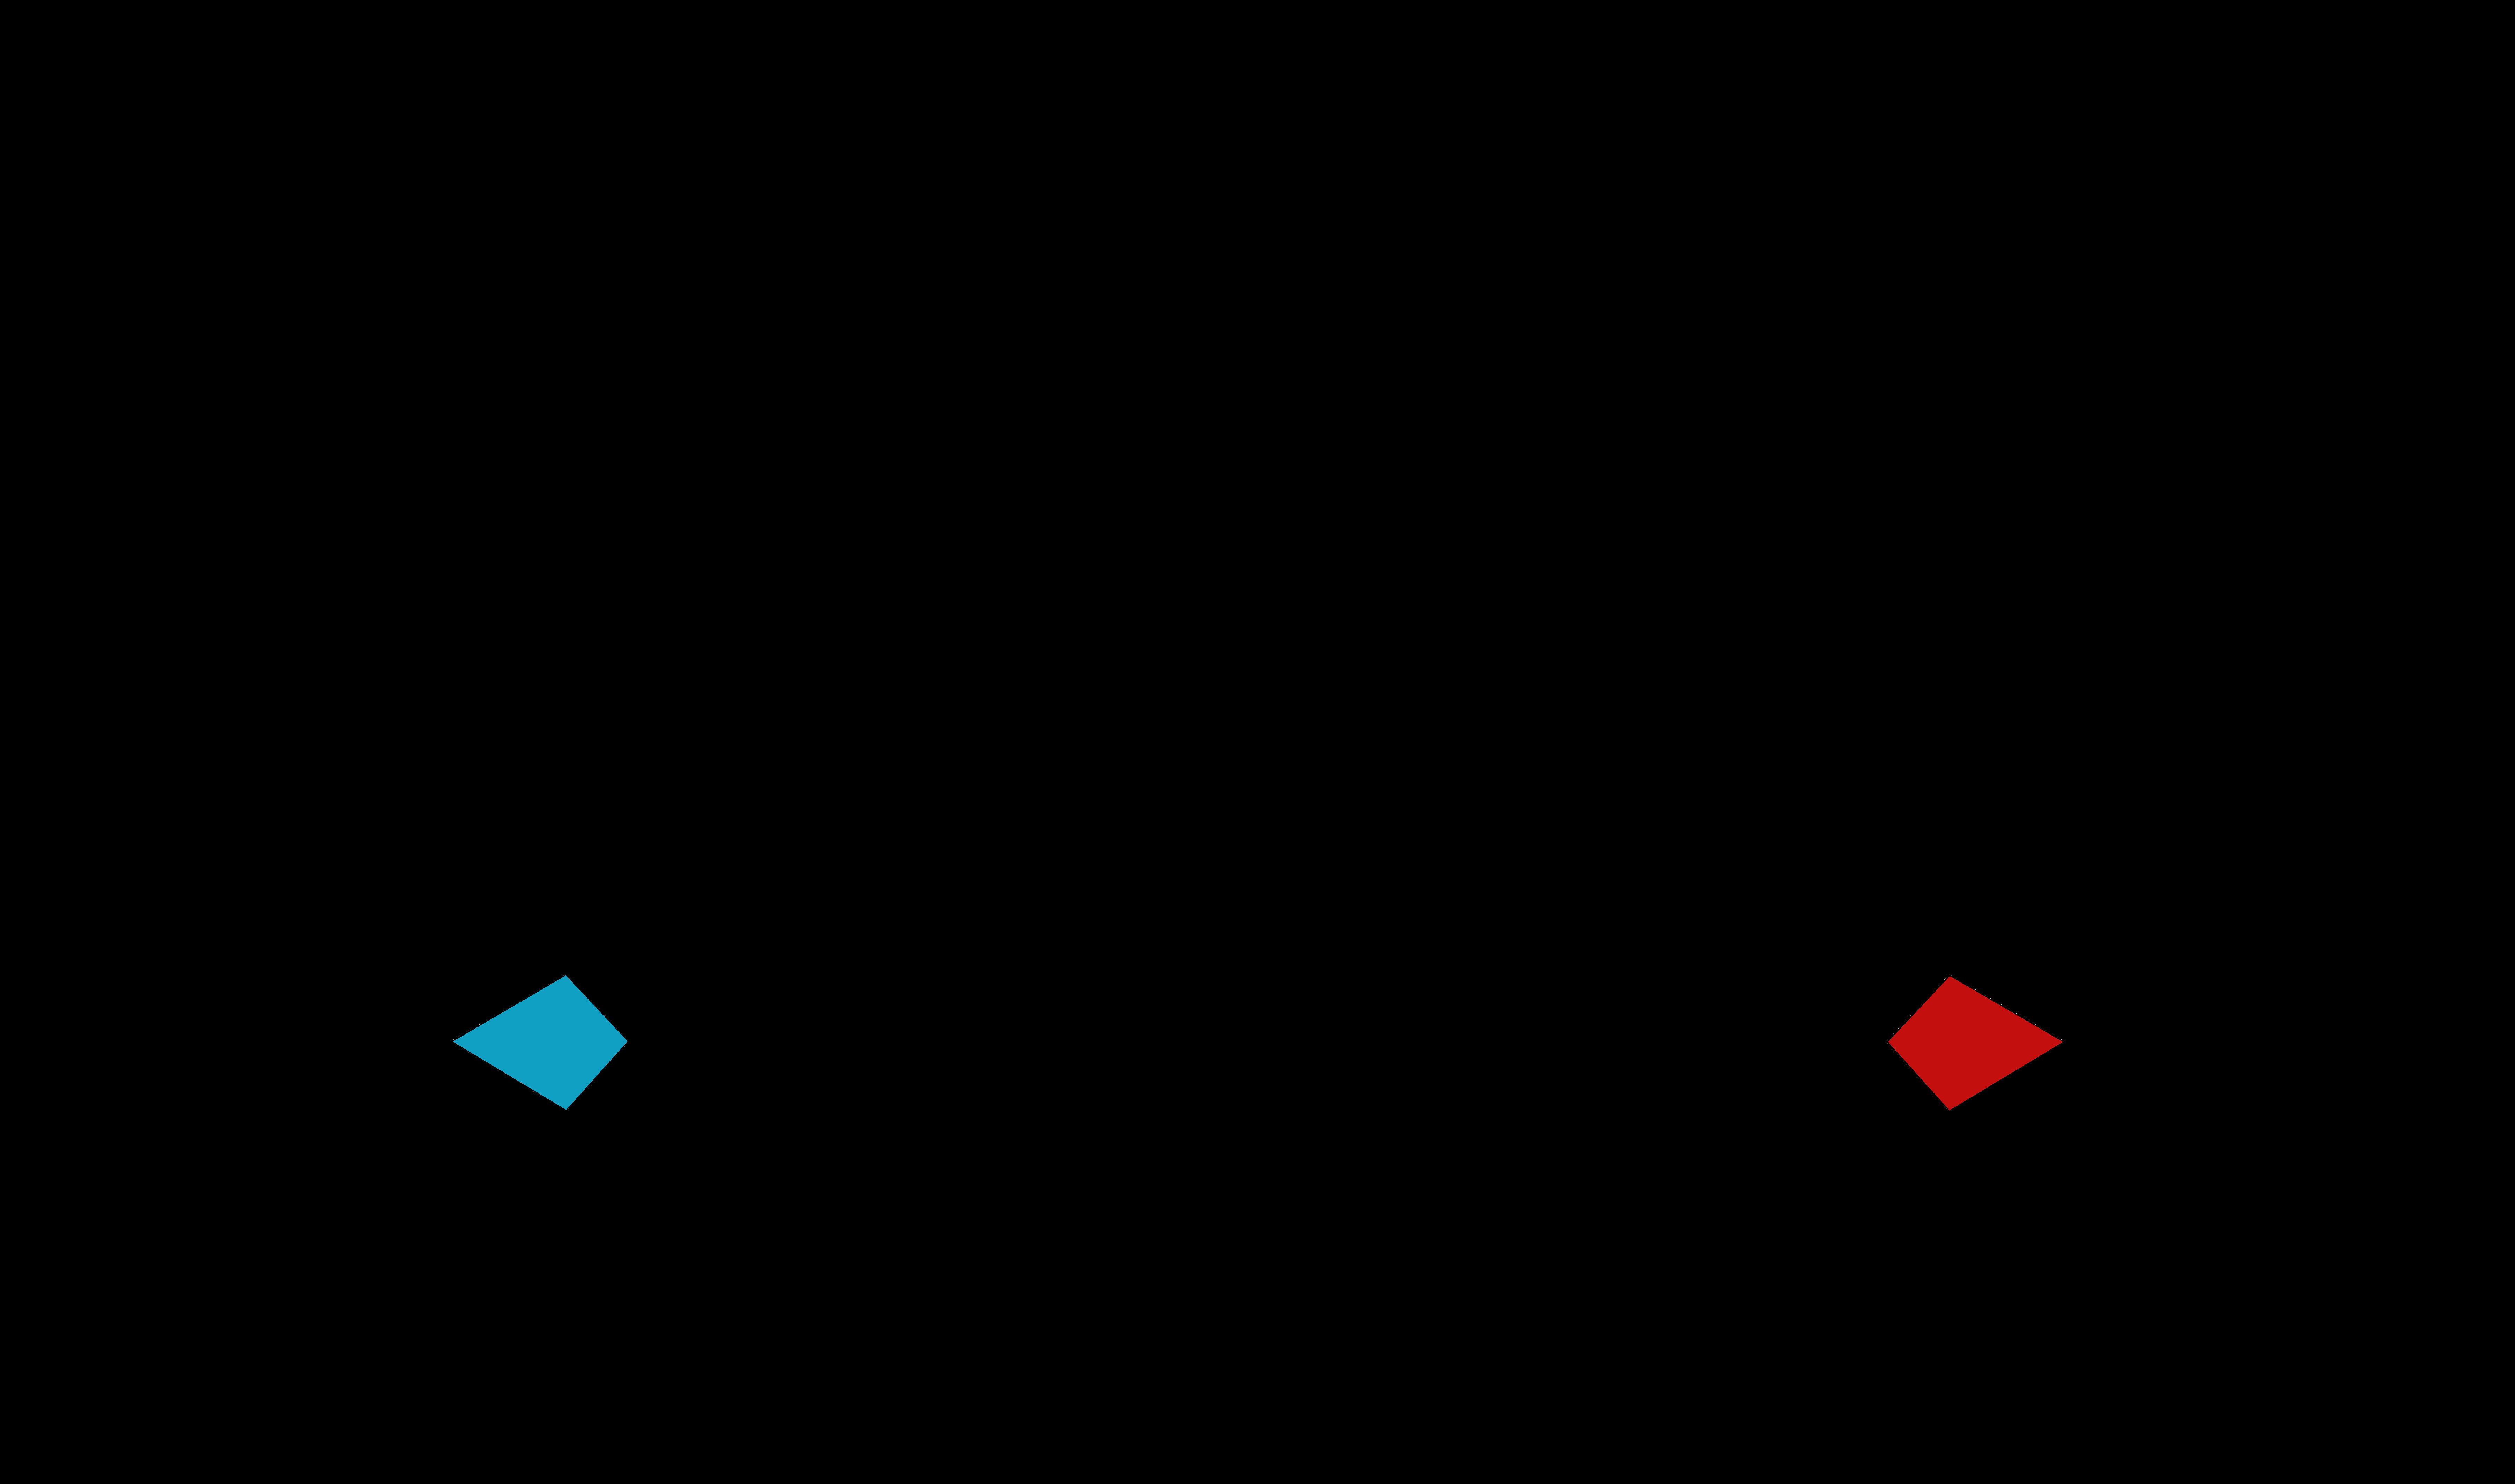 Yugioh Link Format Playmat Full Sized Template 7205 X 4252 Yugioh Playmat Templates